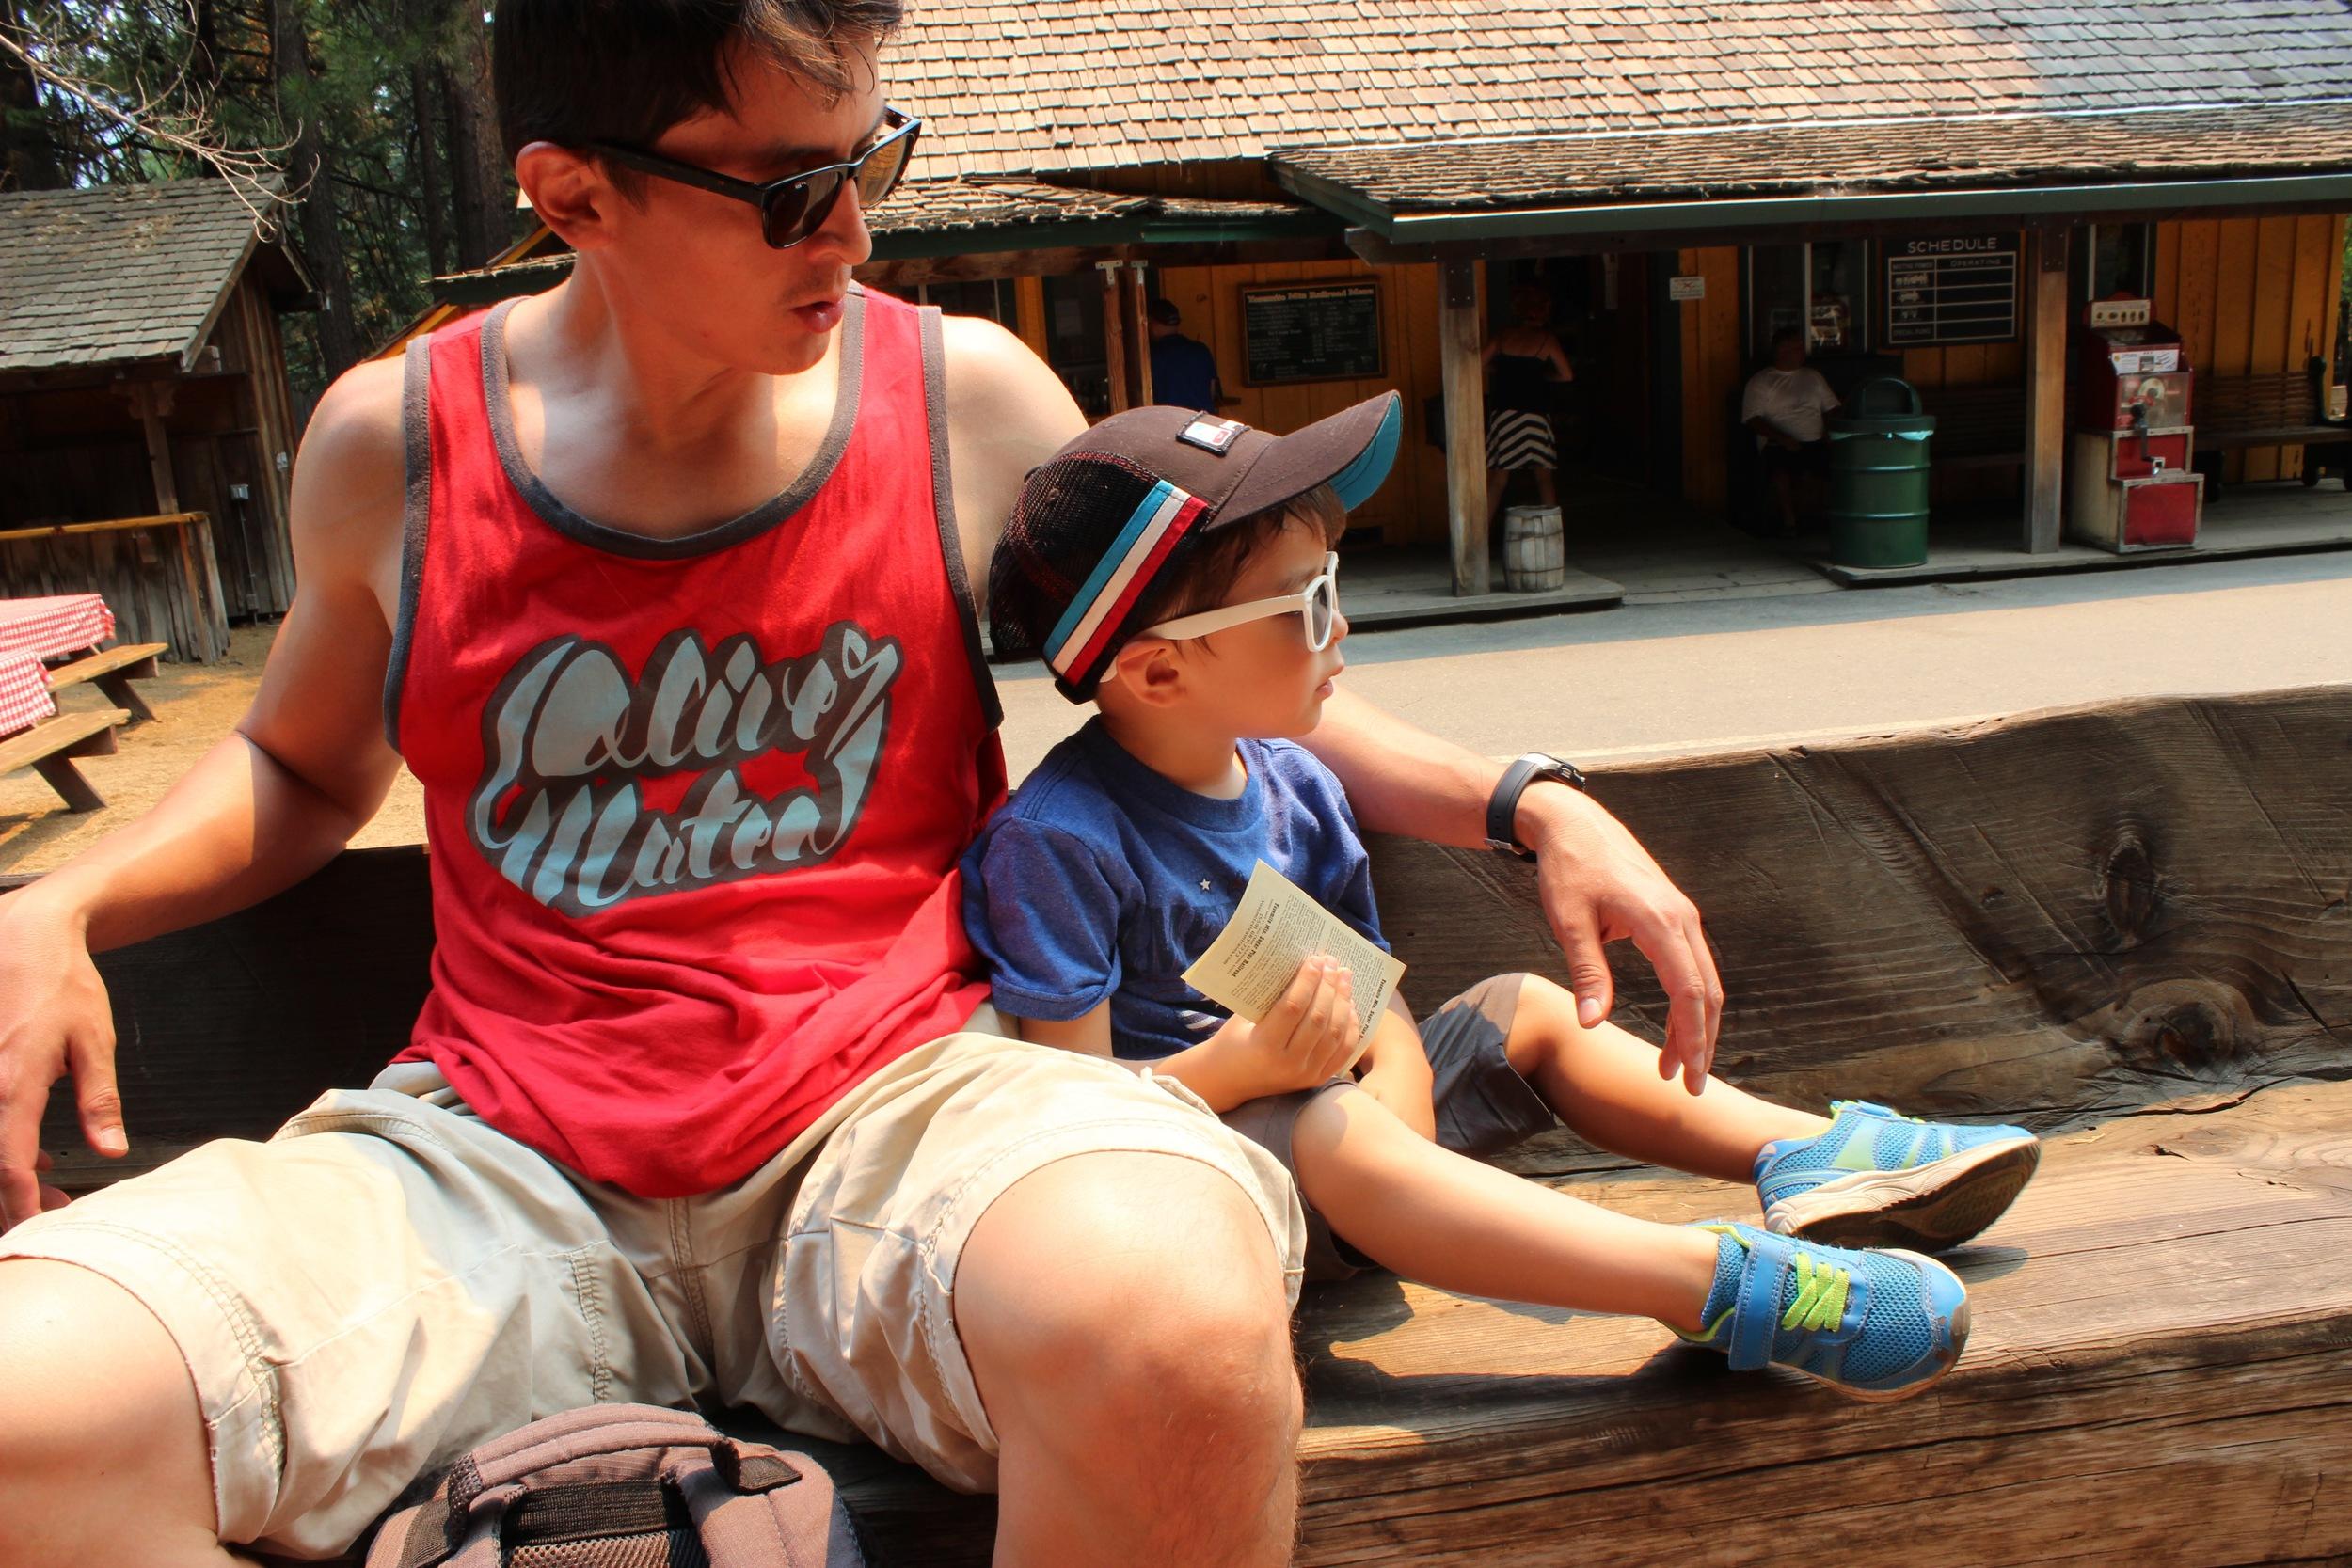 Coarsegold_Ca_KOA_Camping August_2015119.jpg